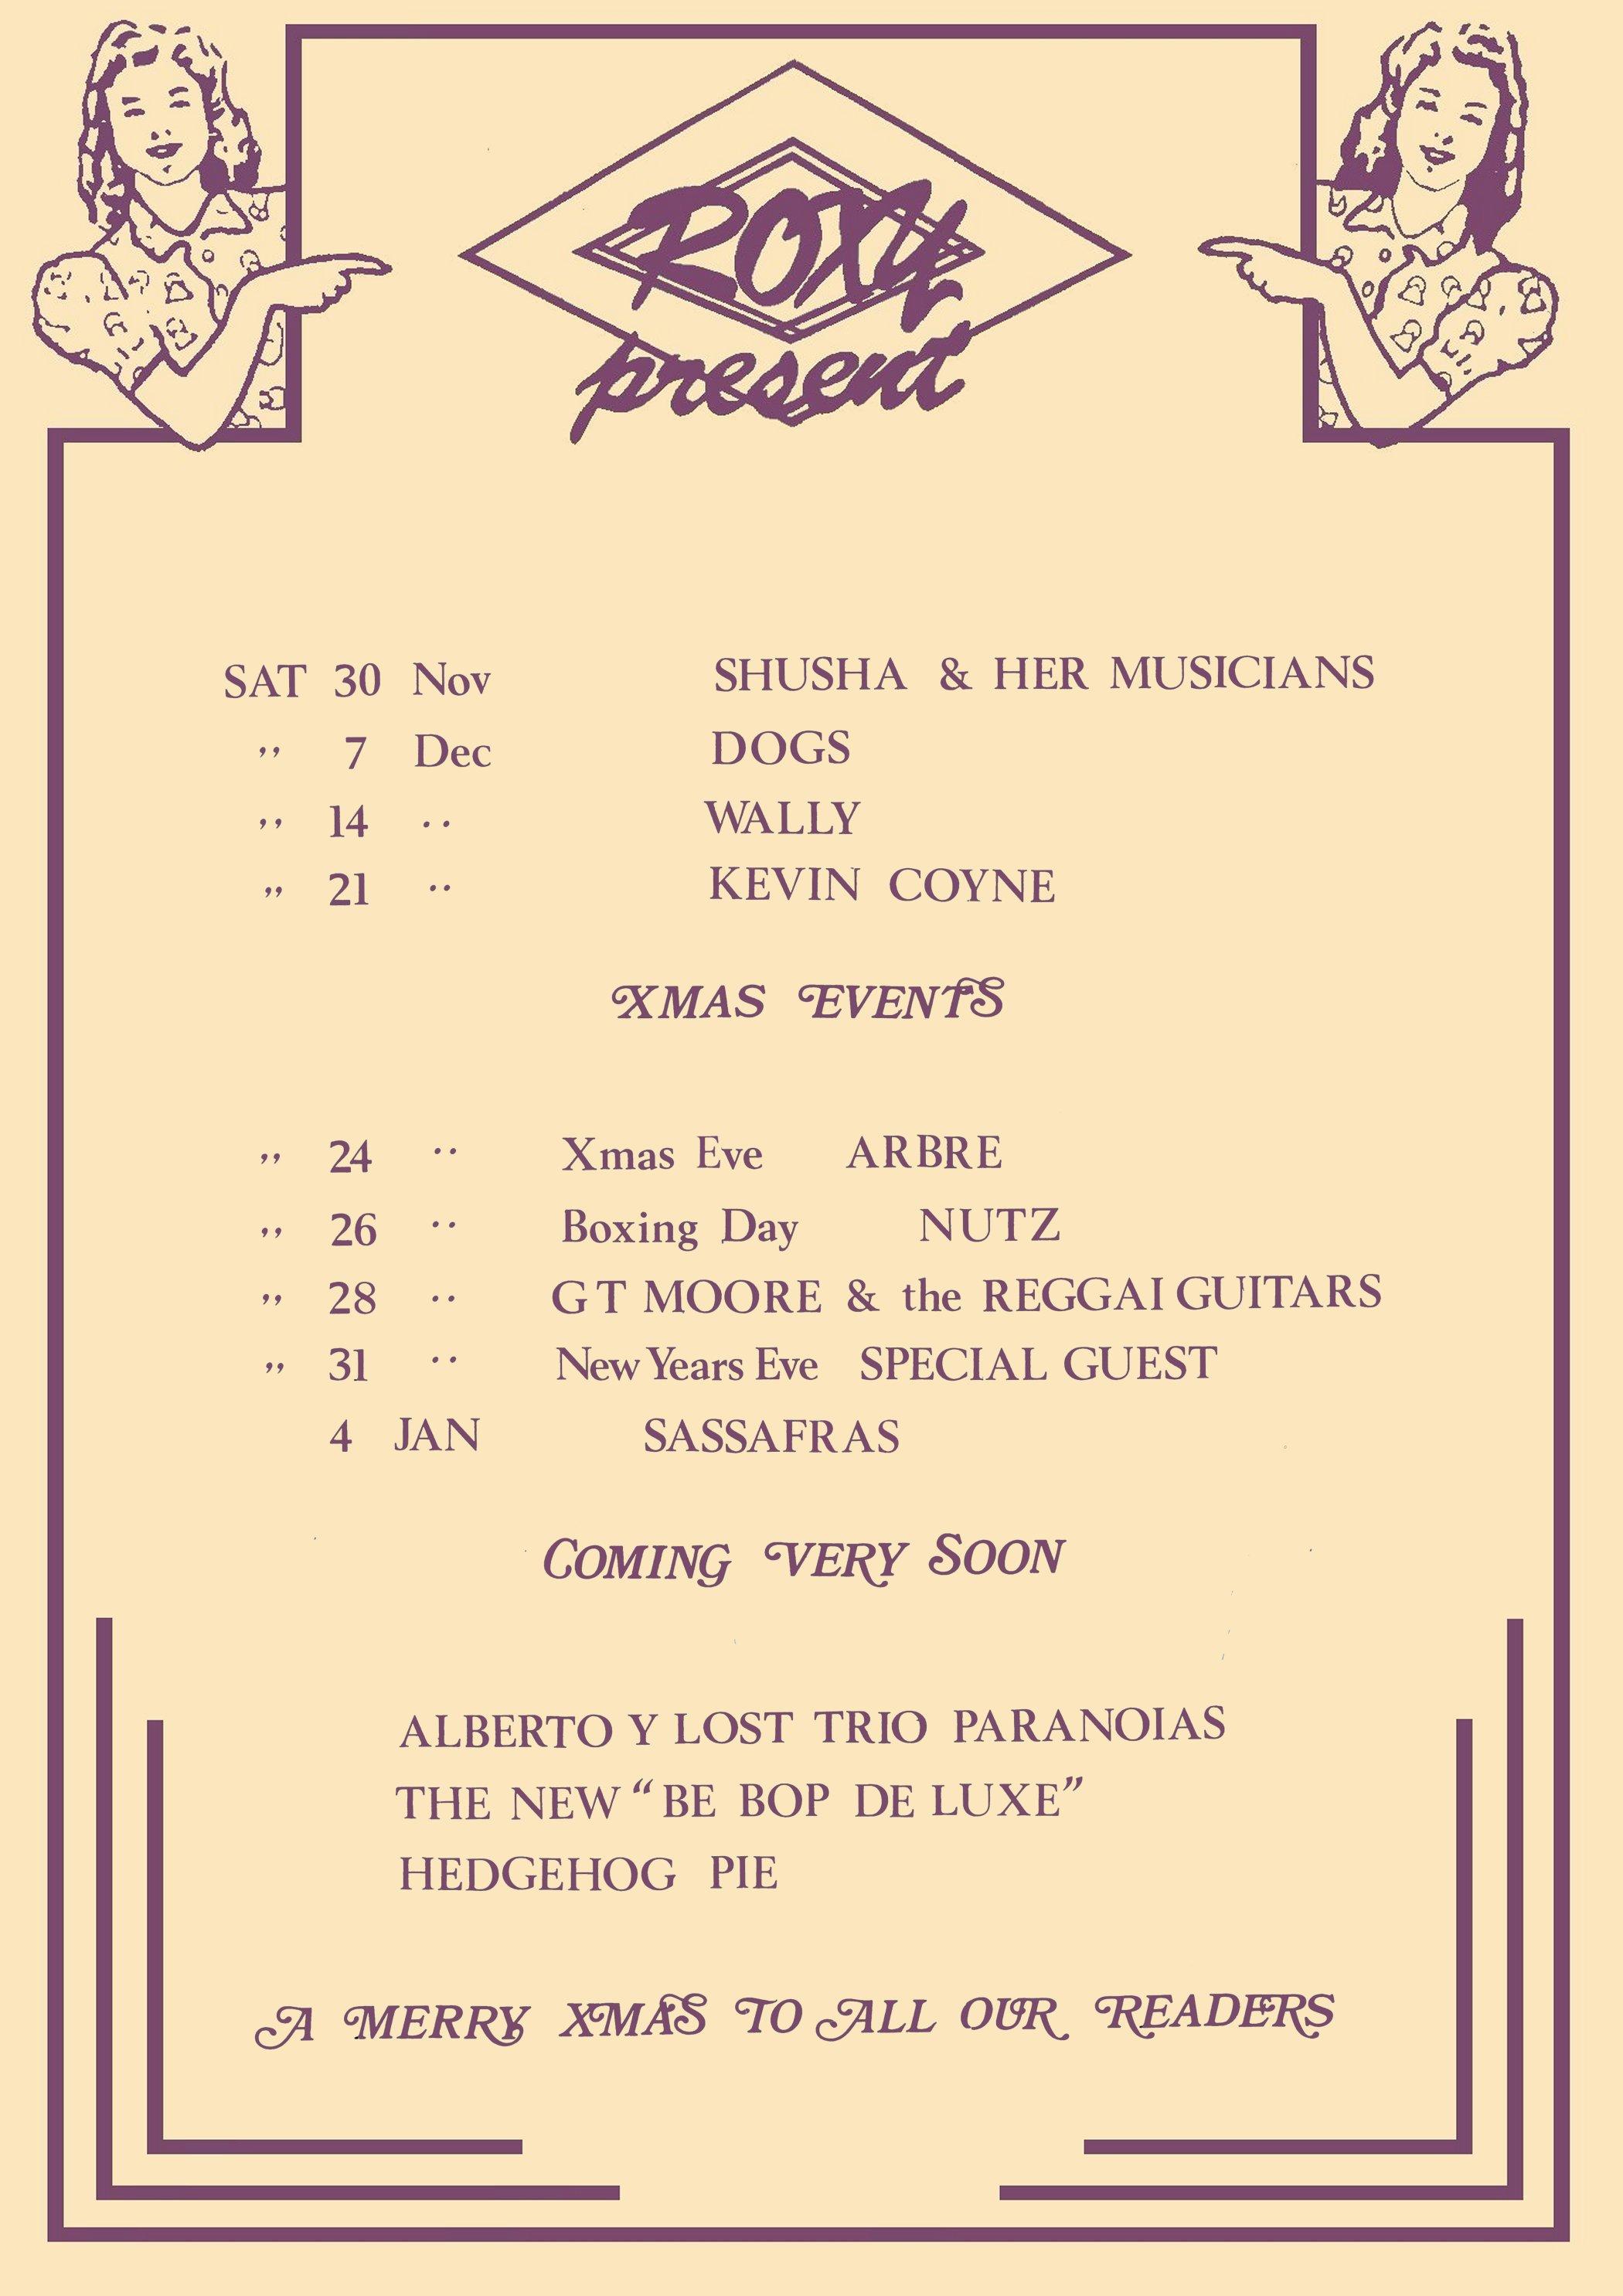 Roxy poster 1974